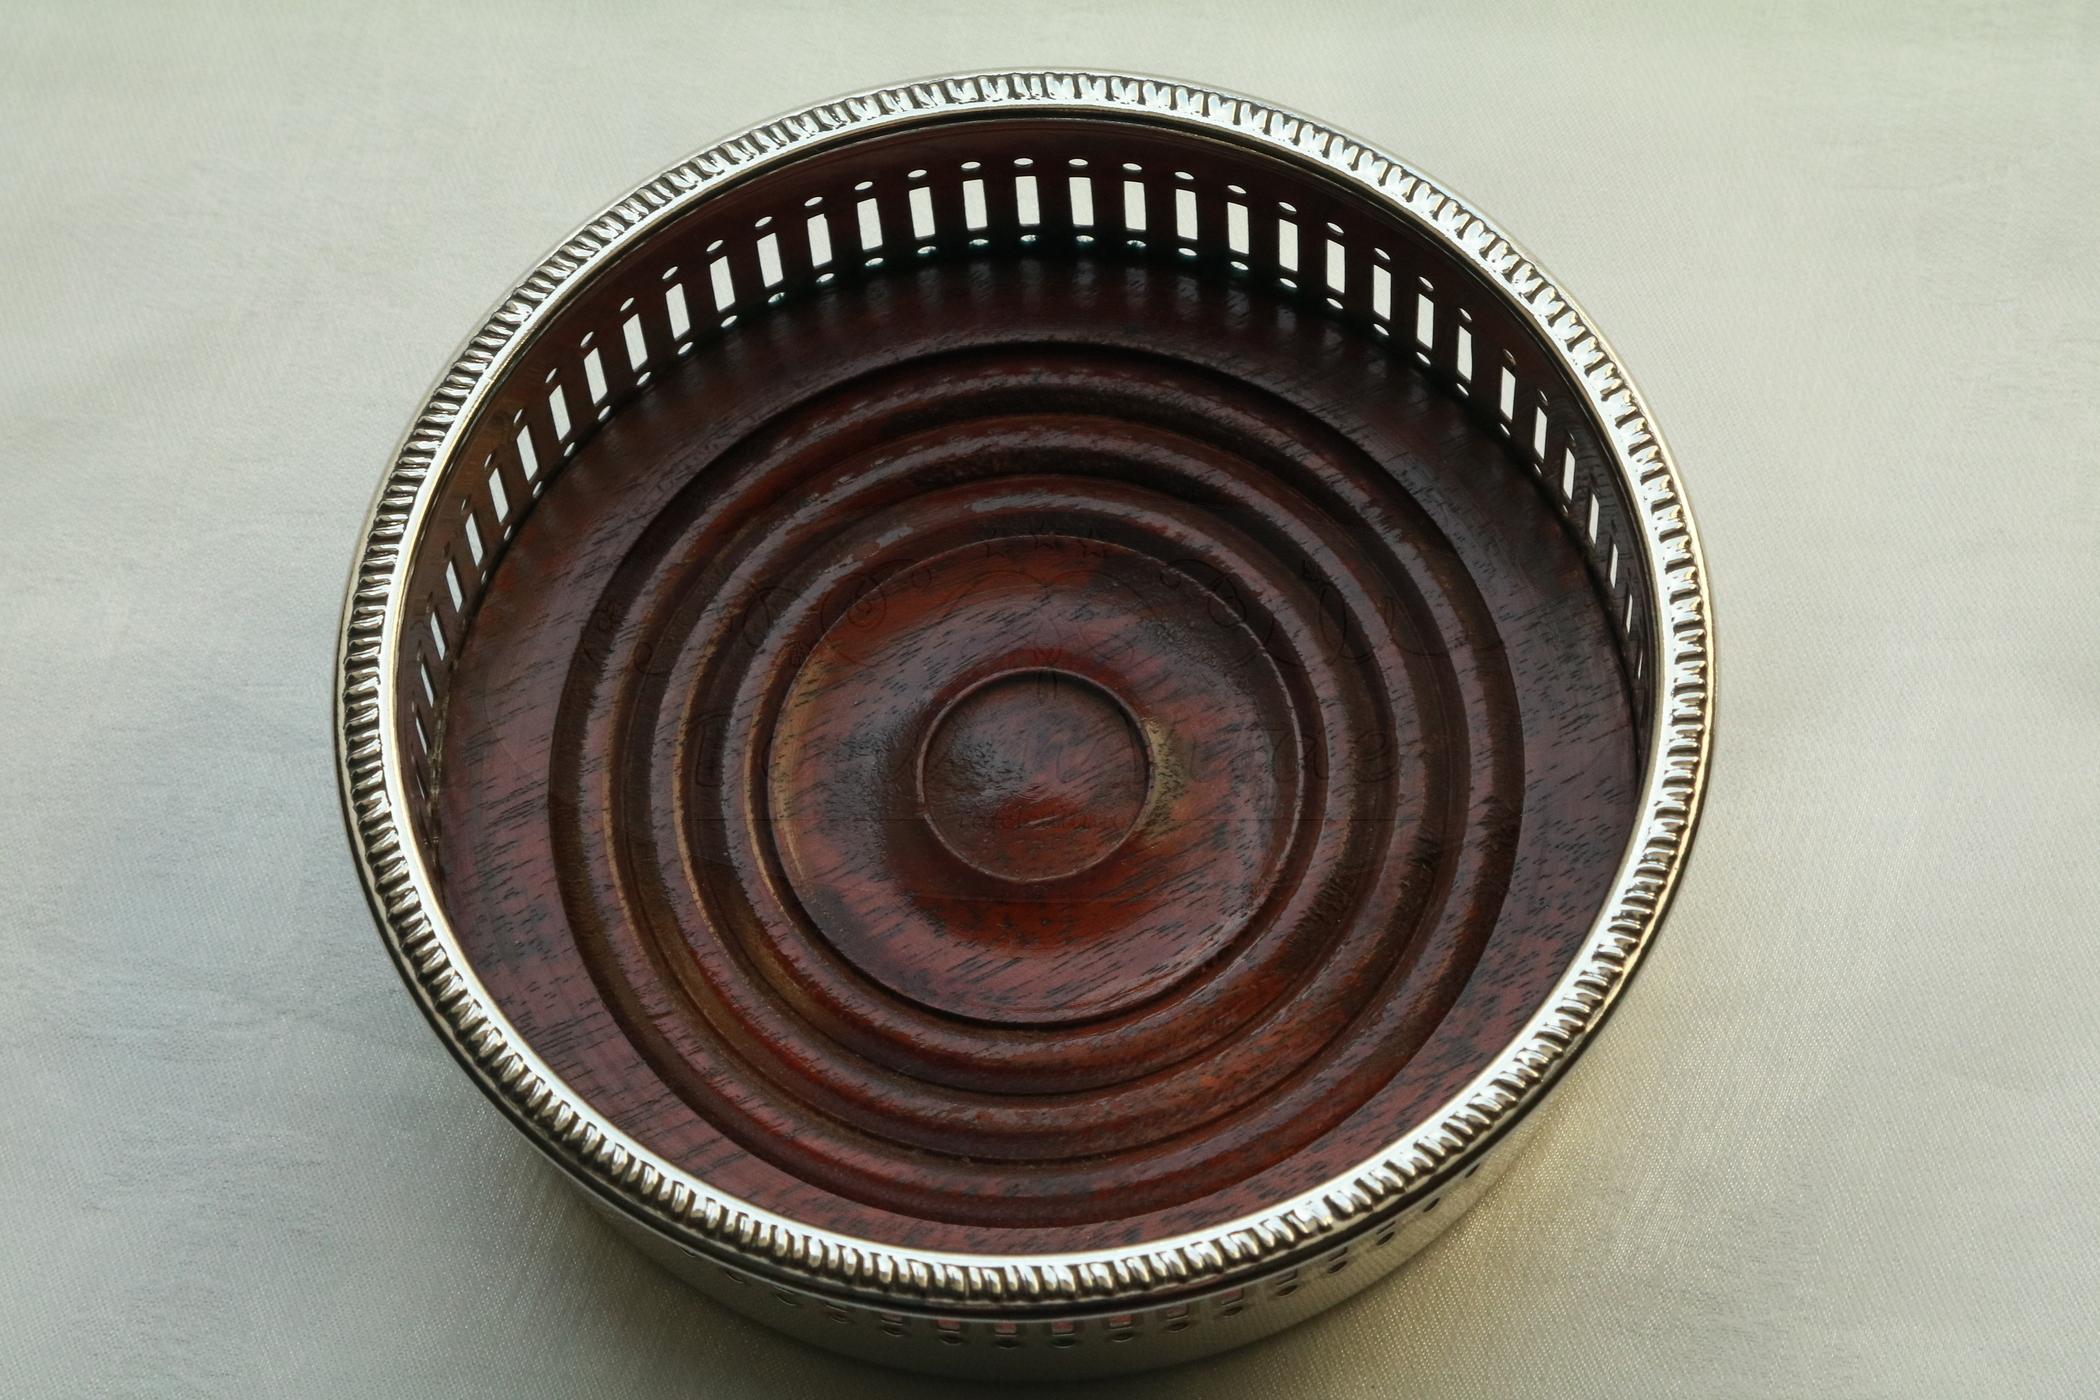 Verzilverde flessenbak met houten bodem